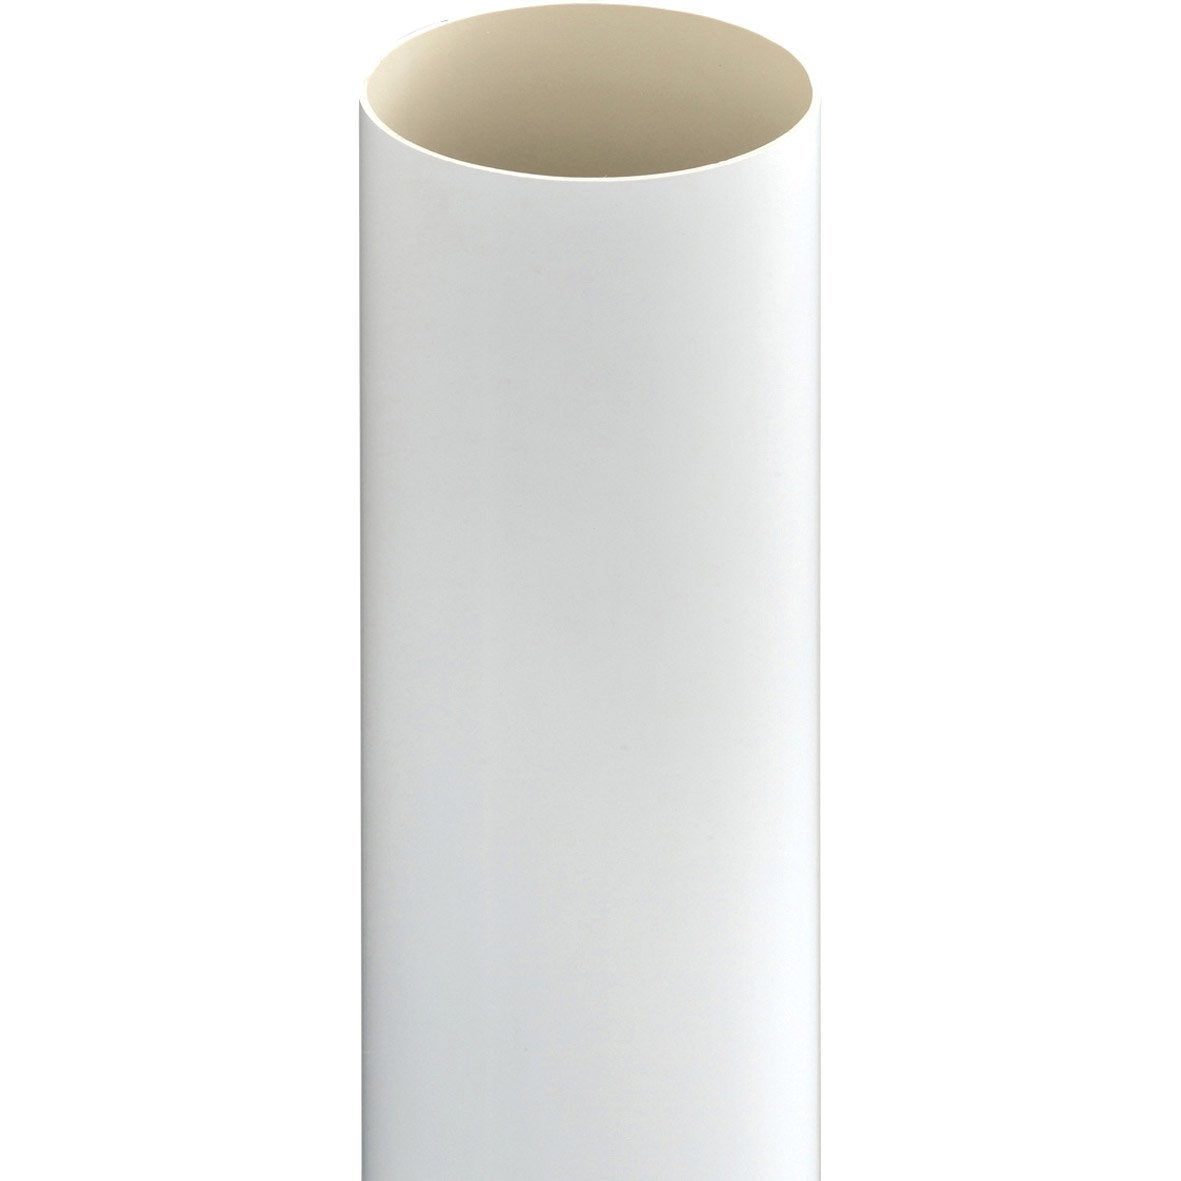 tuyau de descente pvc blanc mm l 4 m girpi leroy merlin. Black Bedroom Furniture Sets. Home Design Ideas